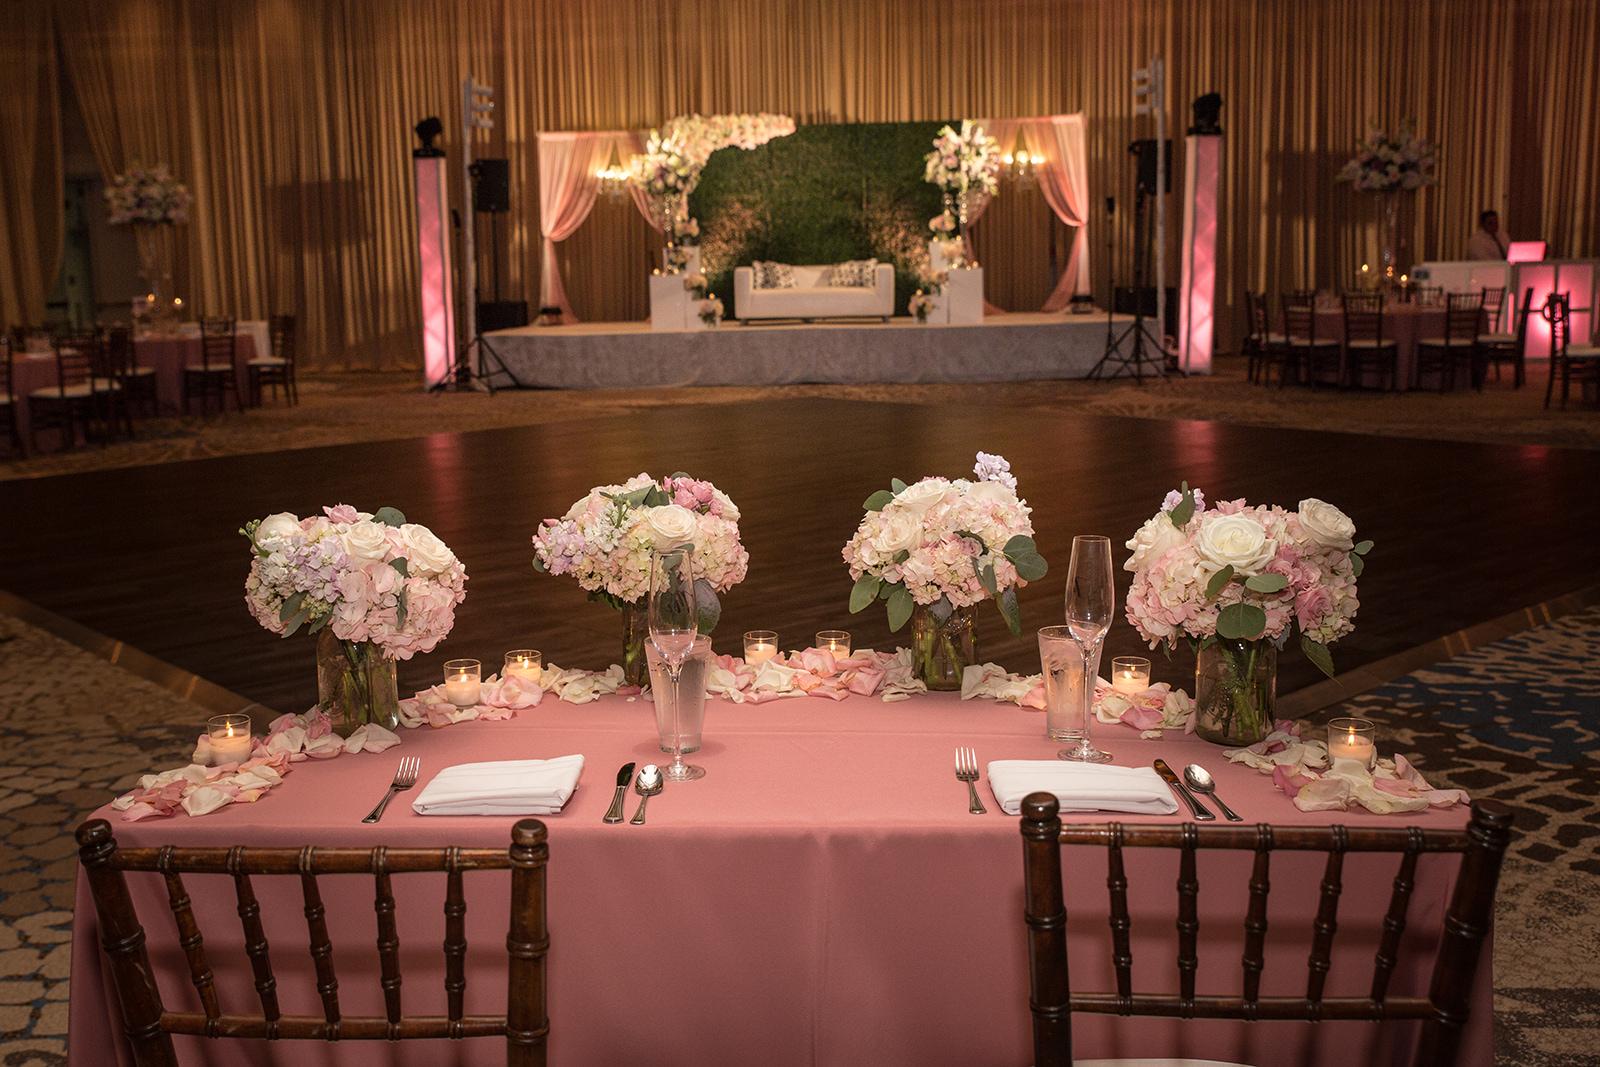 Le Cape Weddings - Sumeet and Chavi - Reception Details  -31.jpg